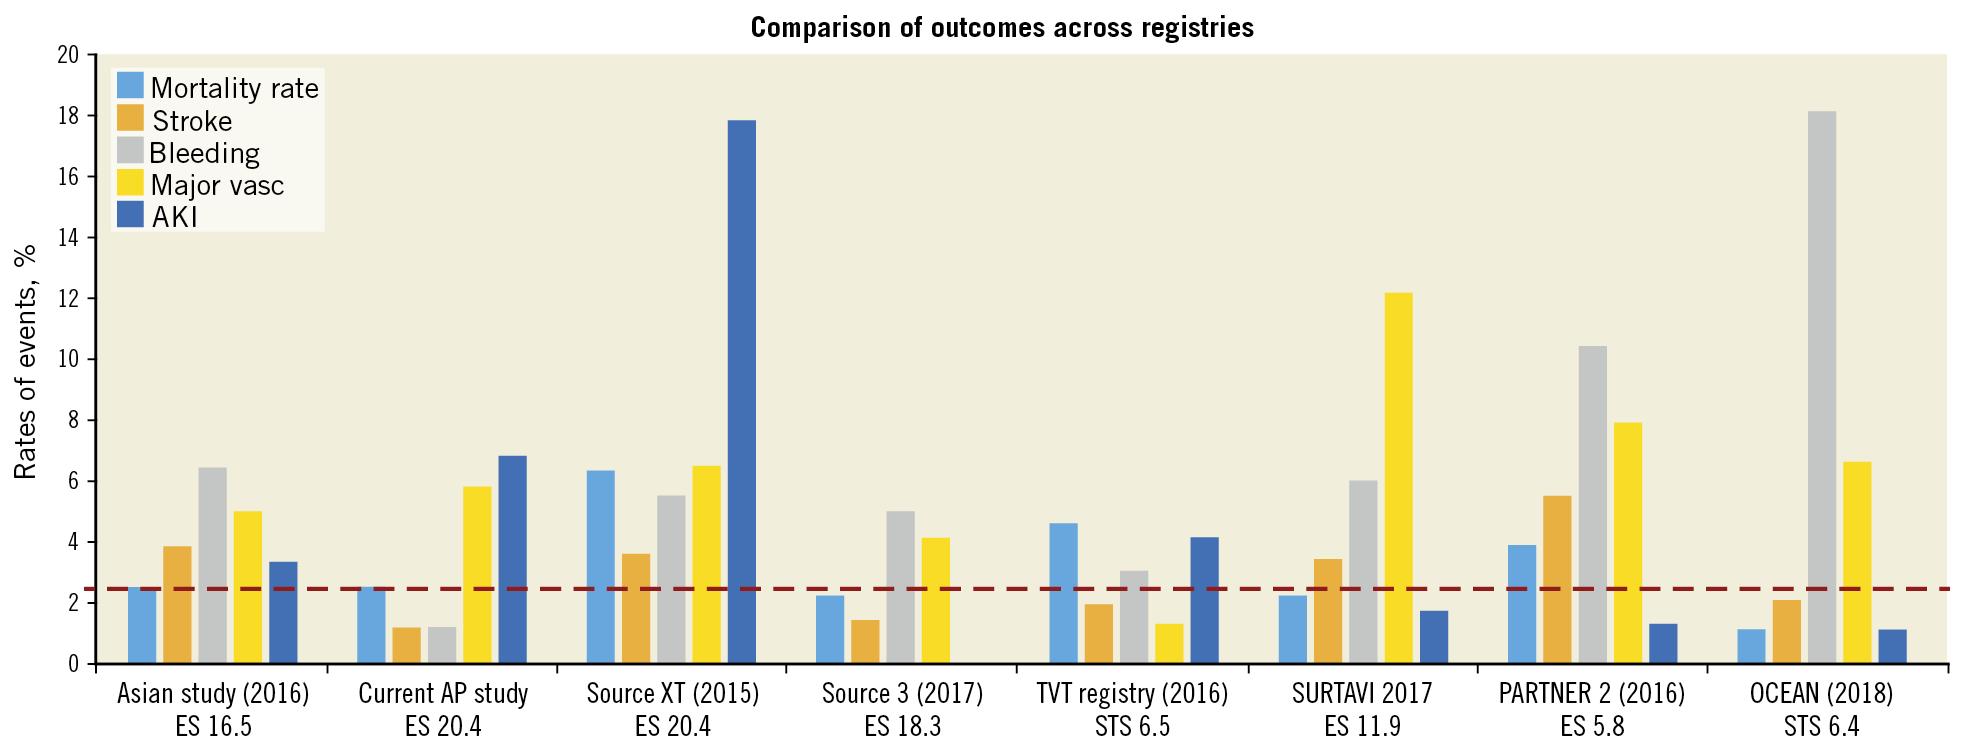 Figure 4. Comparison of outcomes across registries13.